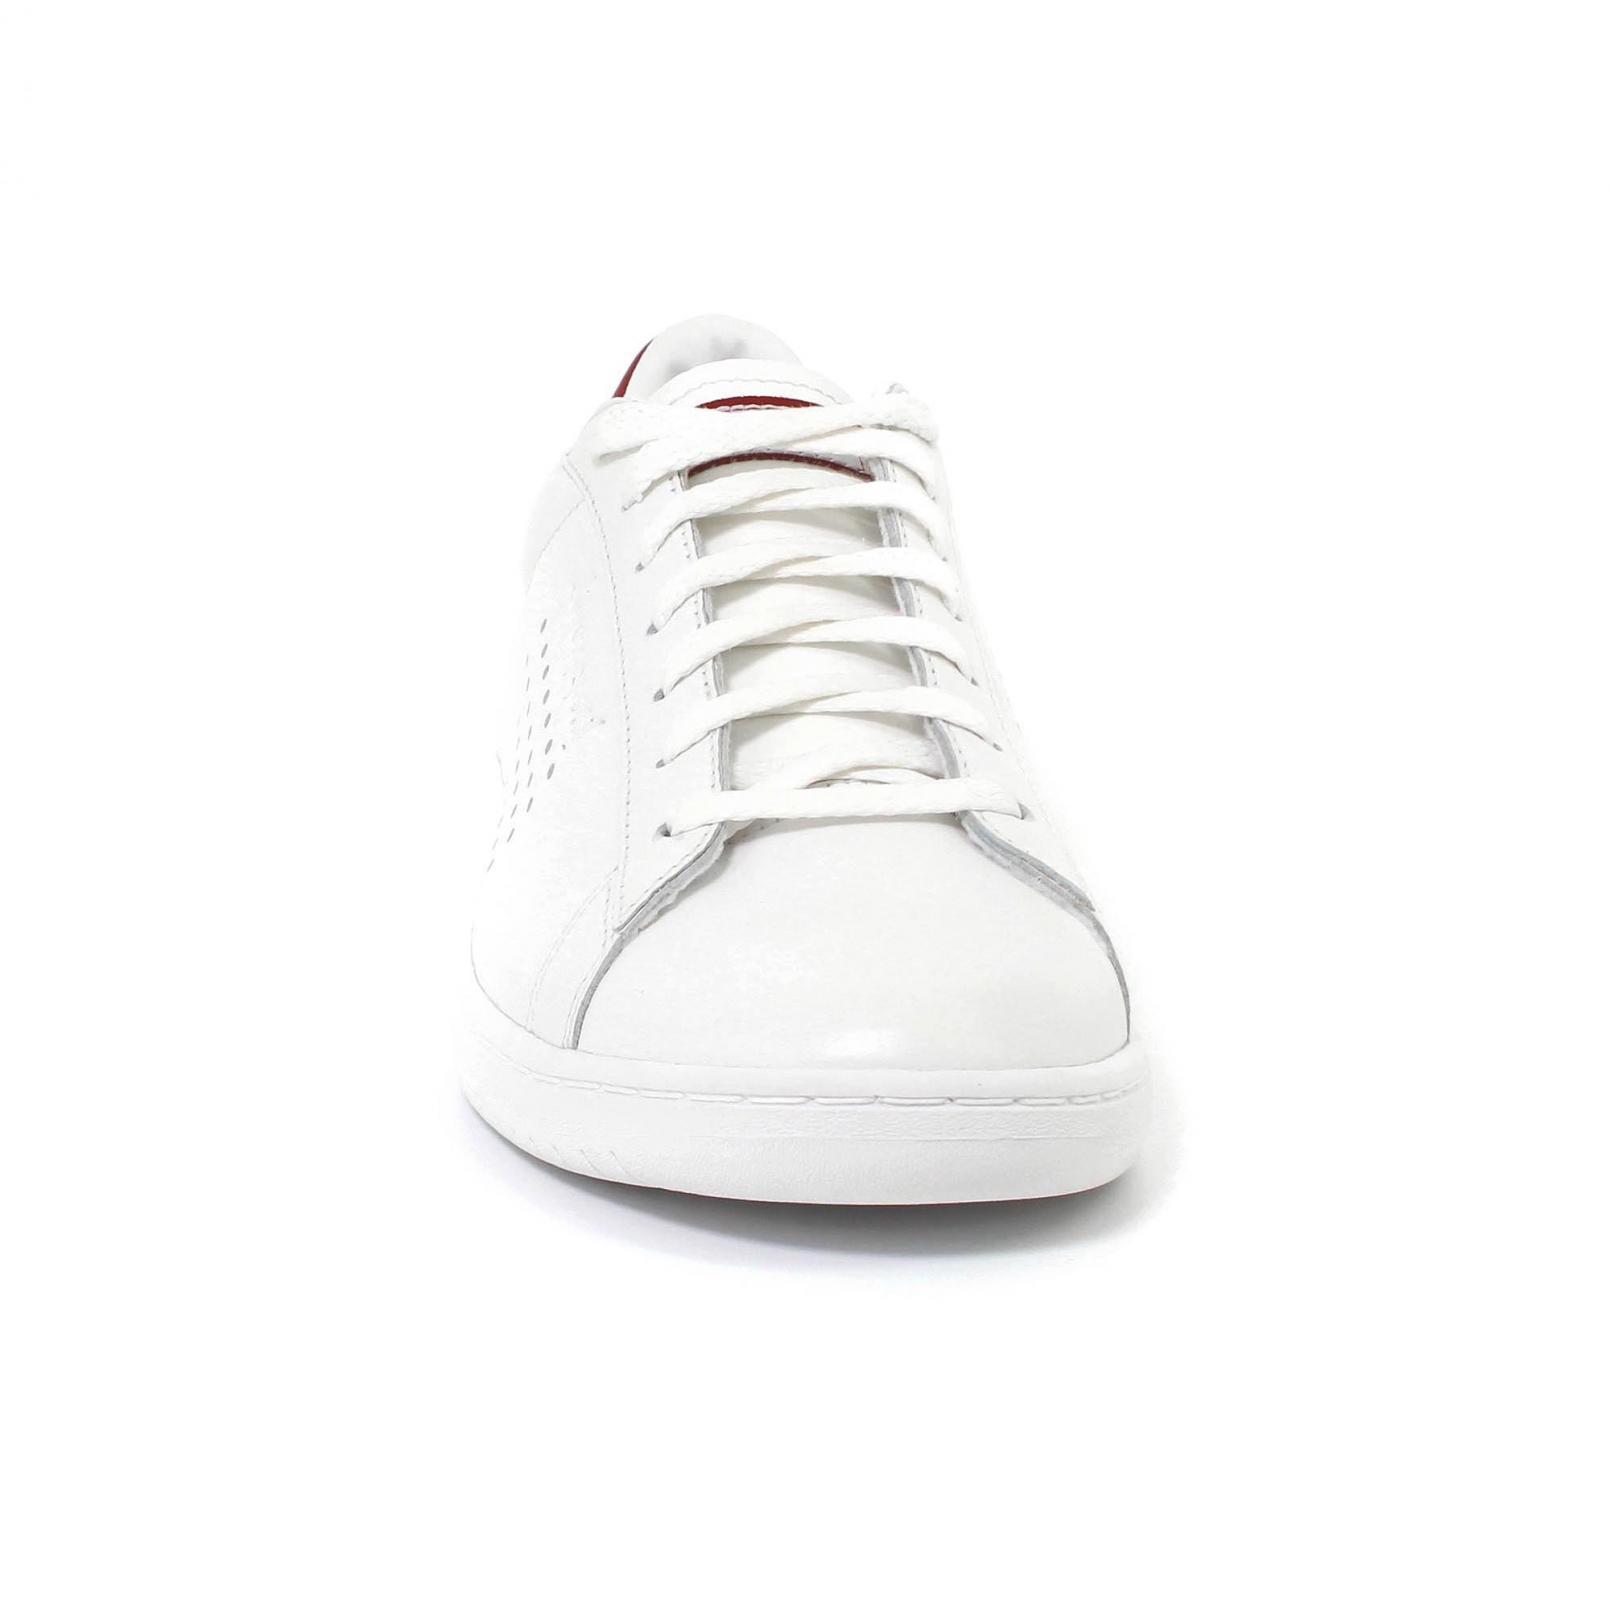 Shoes – Le Coq Sportif Arthur Ashe Lea White/Red